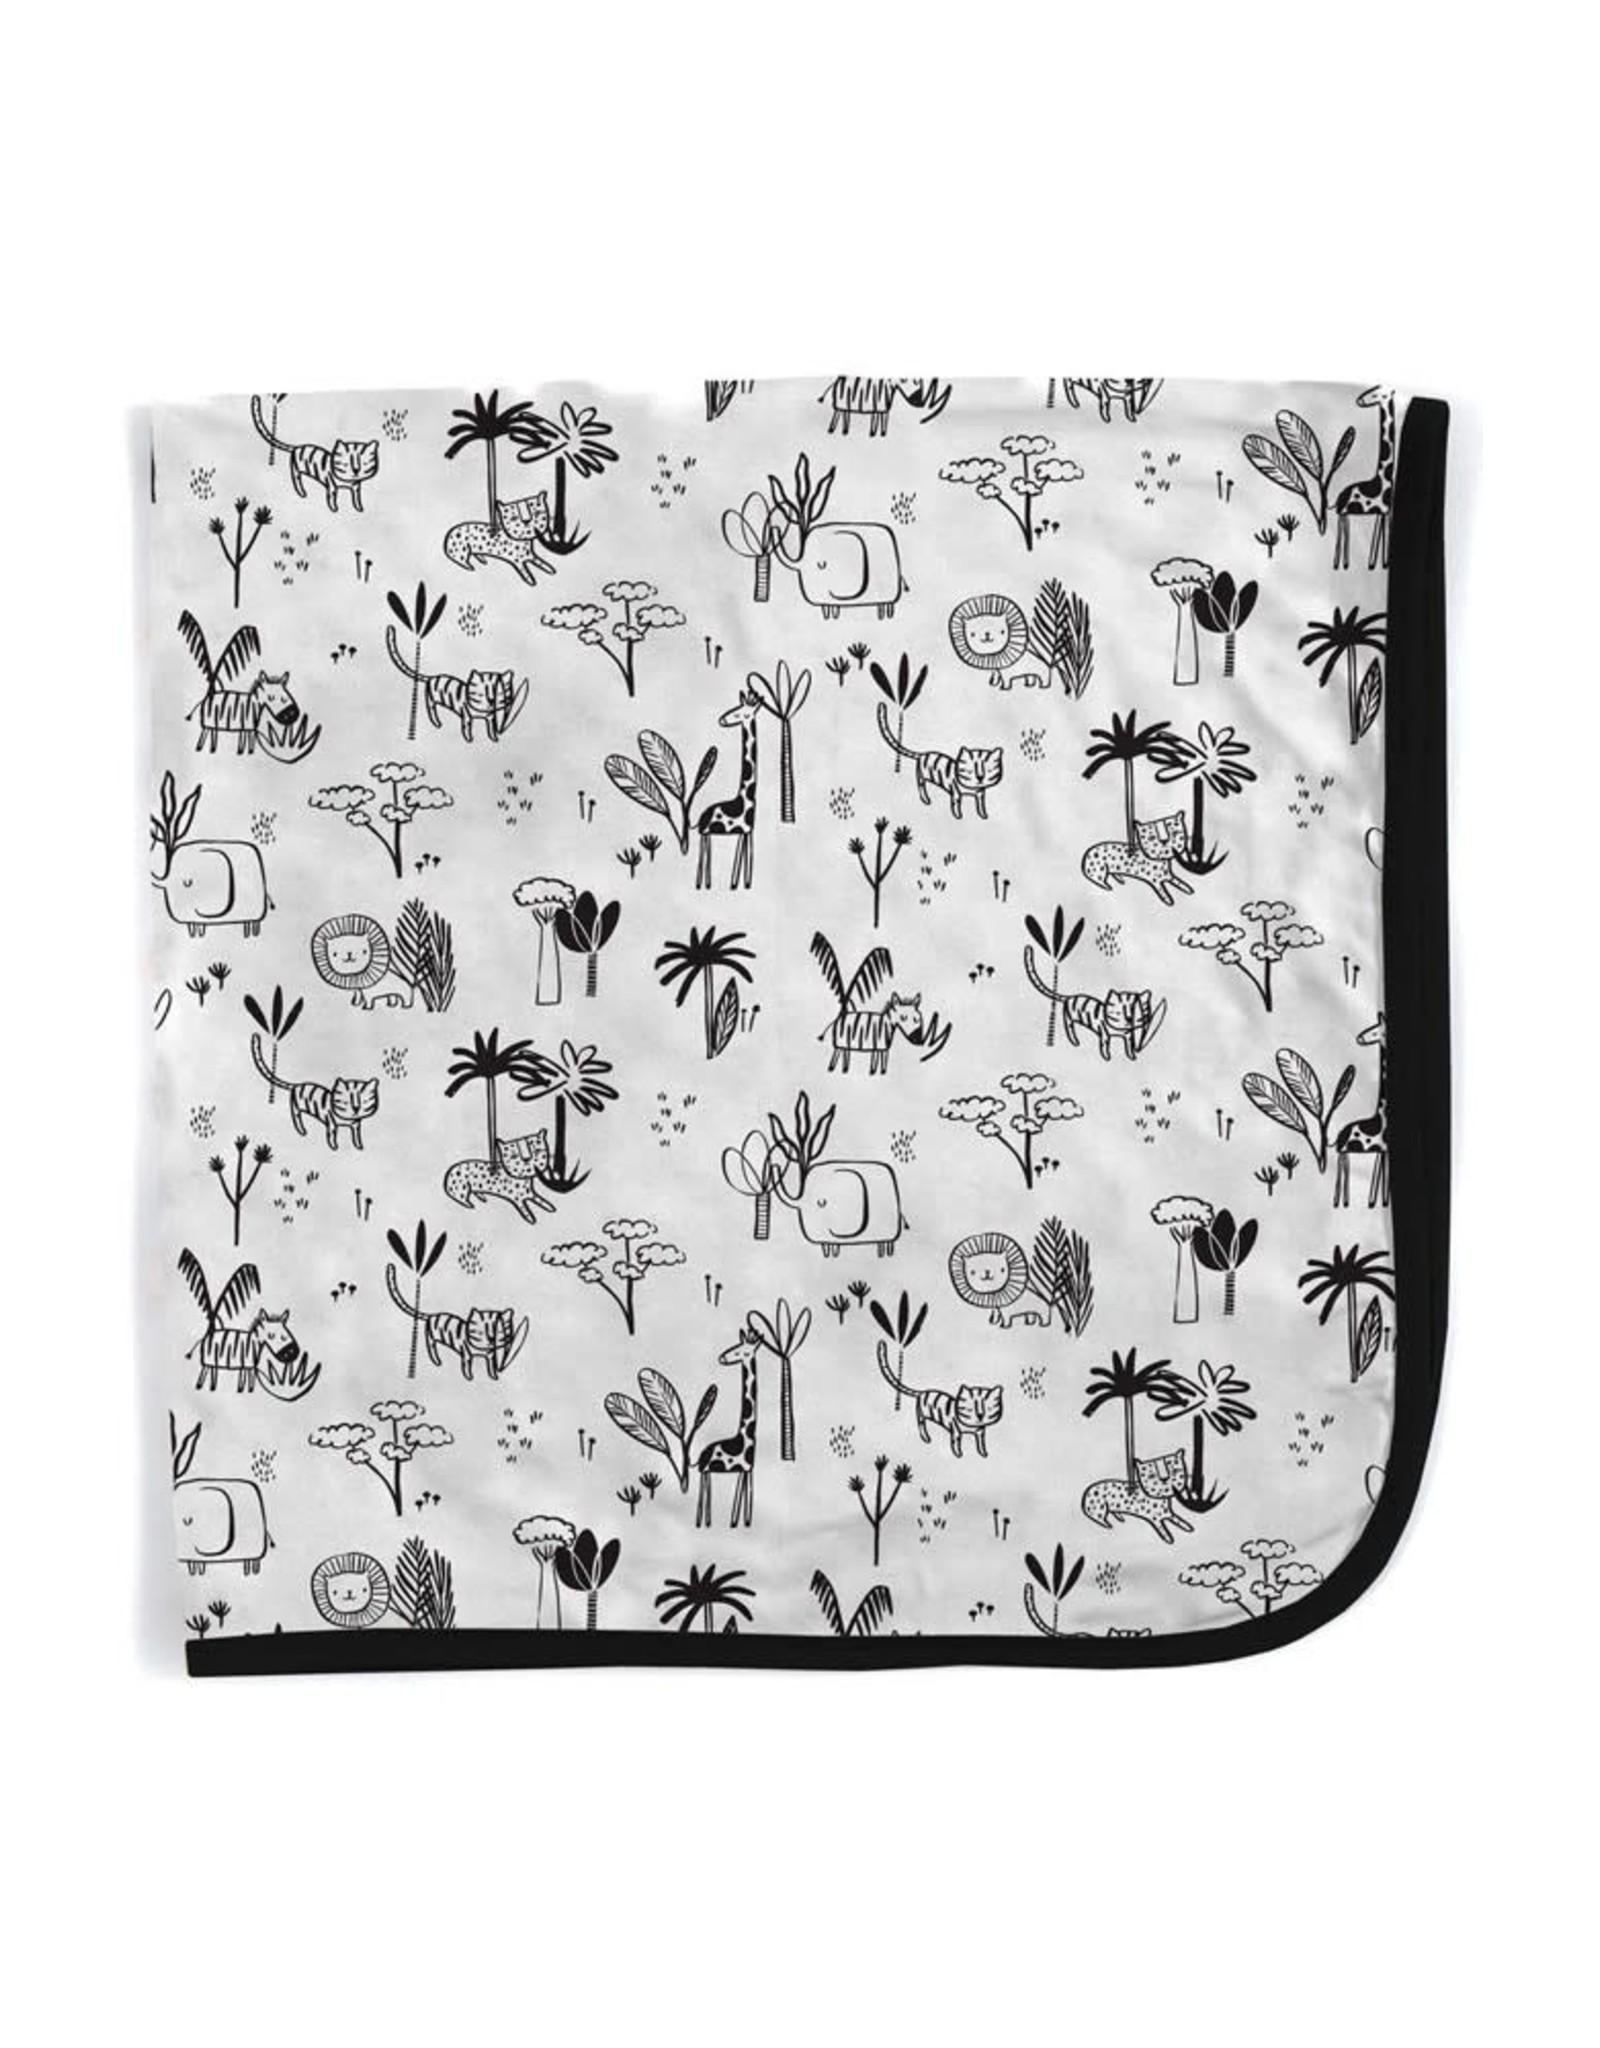 Magnetic Me Magnetic Me- Animal Safari Modal Swaddle Blanket